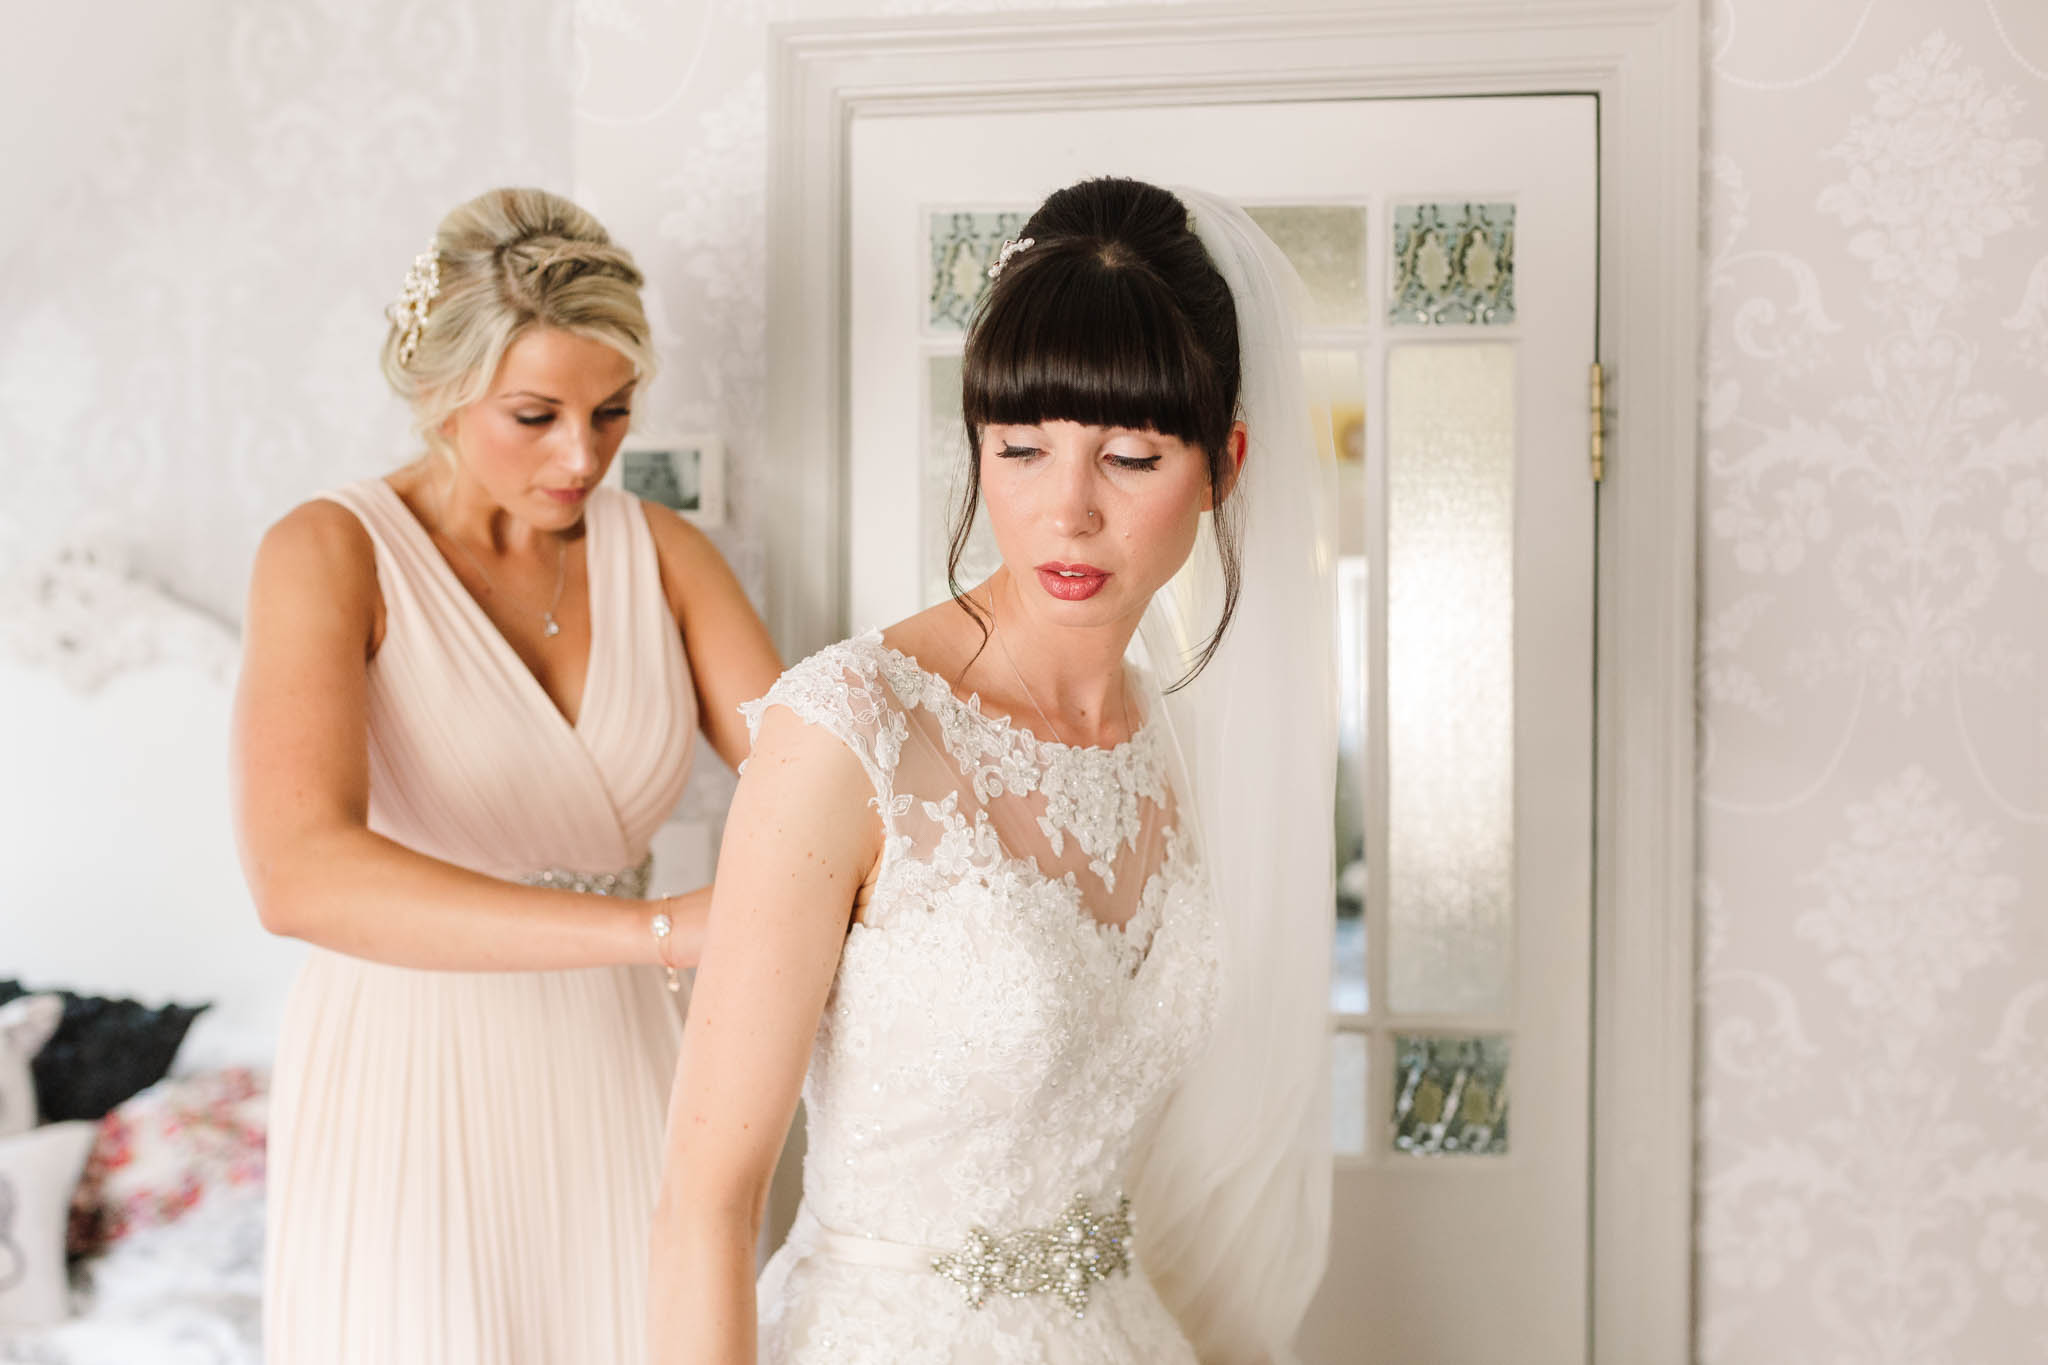 bridesmaid doing up back of brides dress